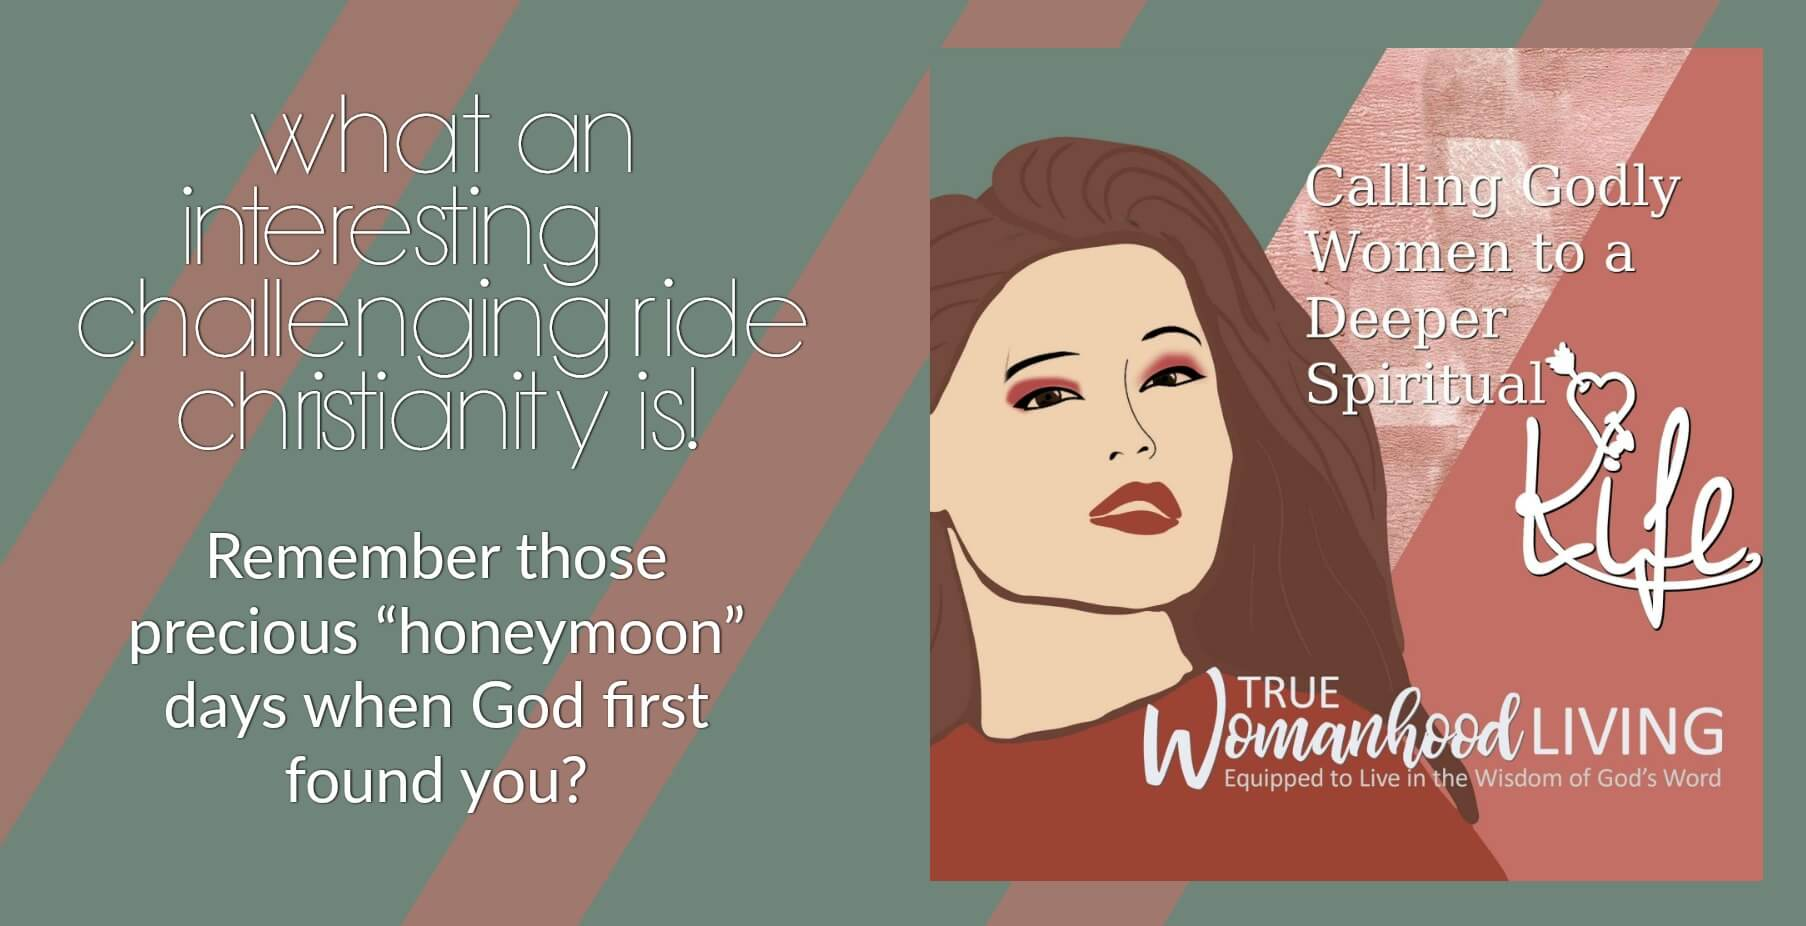 Calling Godly Women to a Deeper Spiritual Life